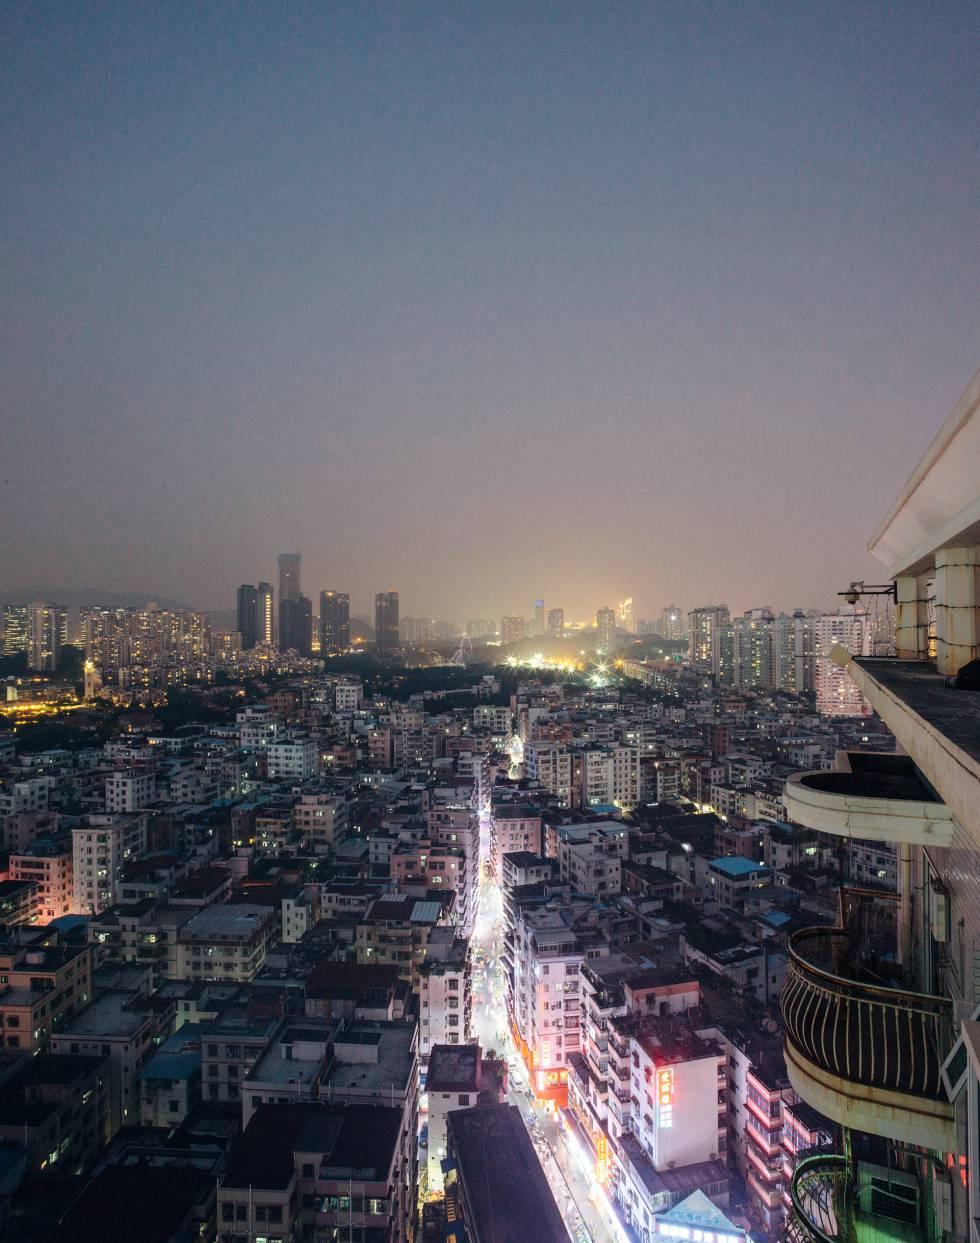 El barrio de Baishizhou.